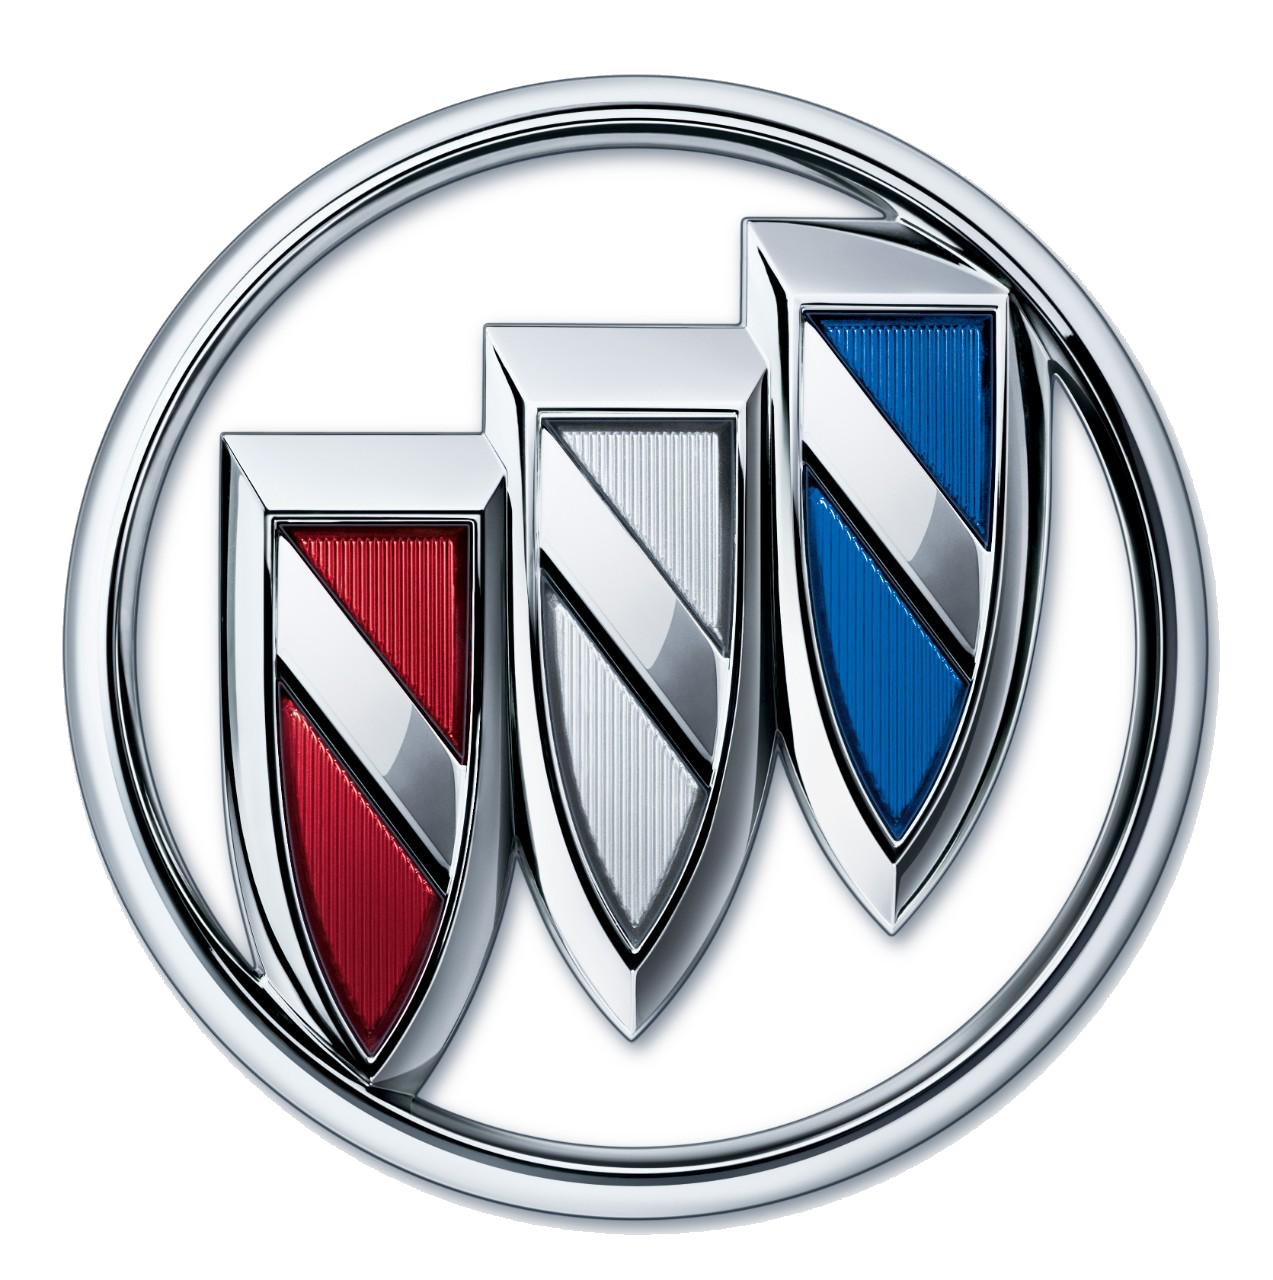 https://secureservercdn.net/198.71.233.39/39k.840.myftpupload.com/wp-content/uploads/2020/01/Buick_Logo-2014-10-16-19.png